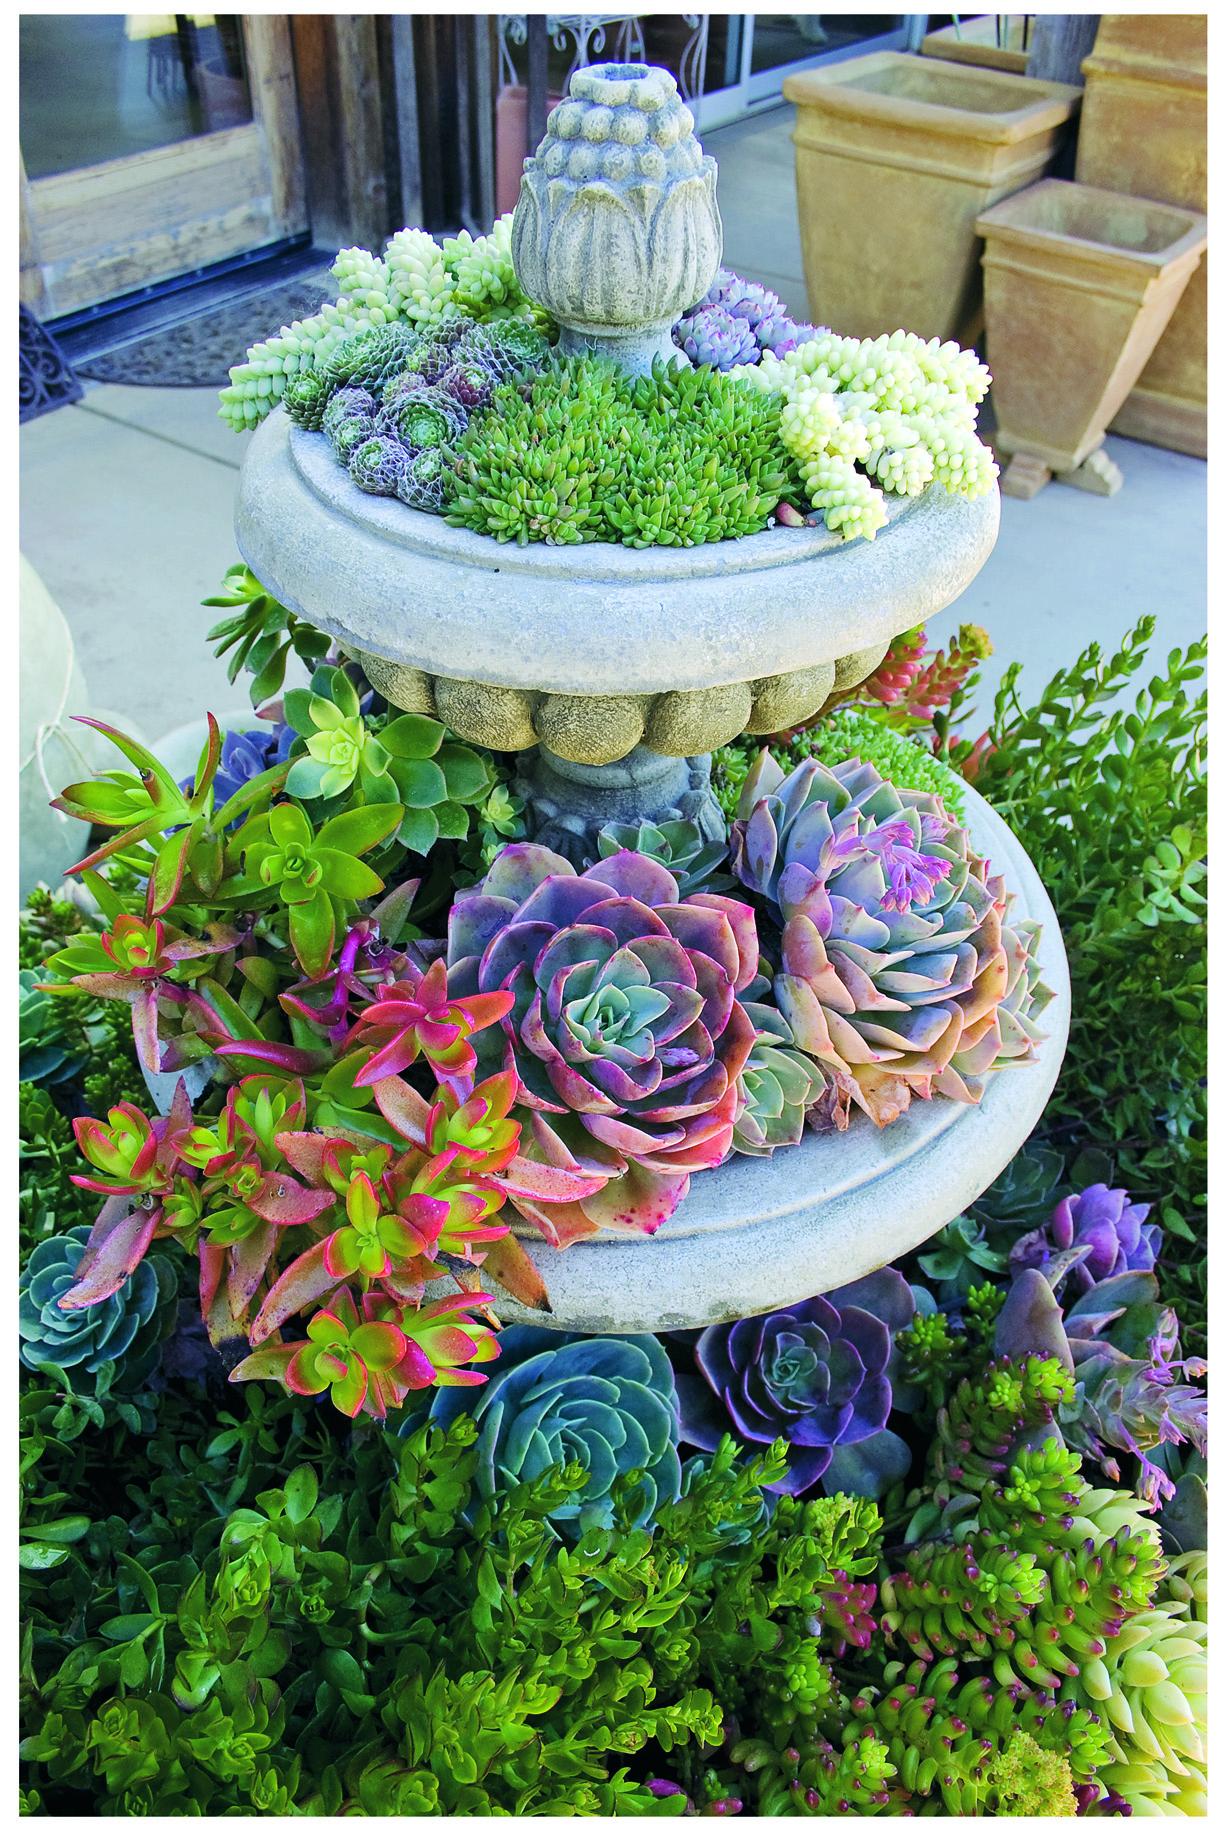 40 Unique & Fun Container Garden Ideas